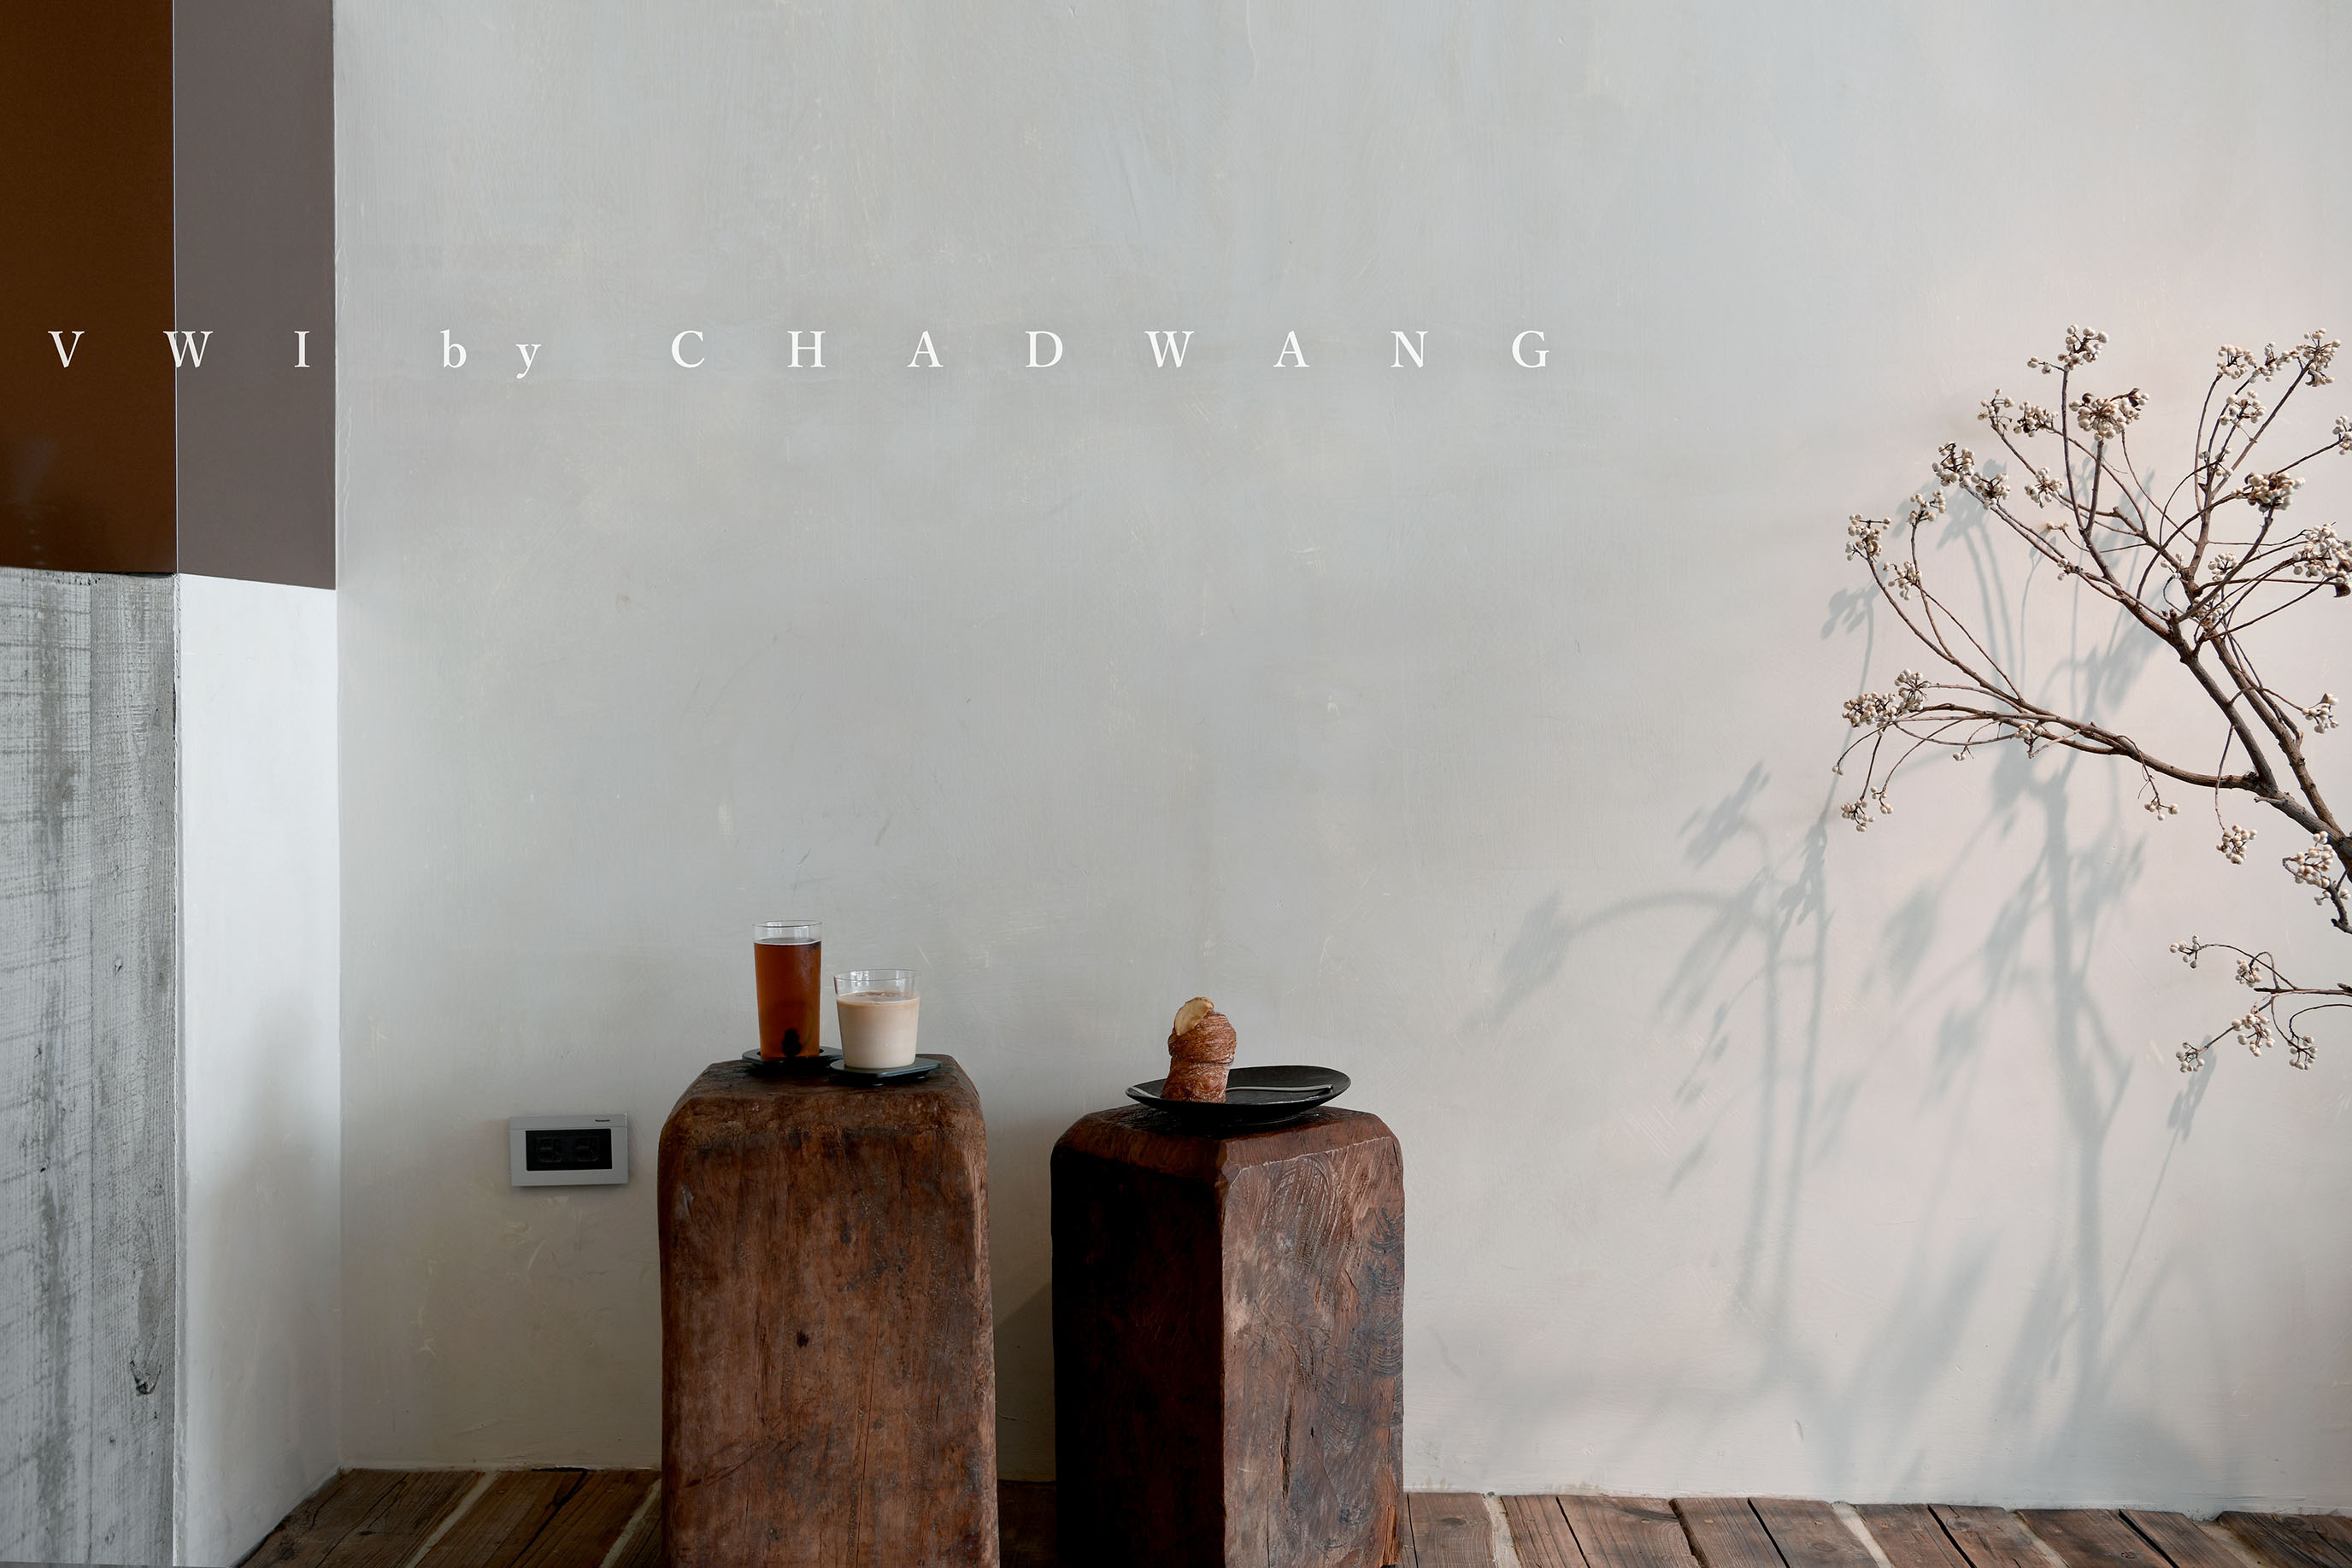 vwi by chadwang